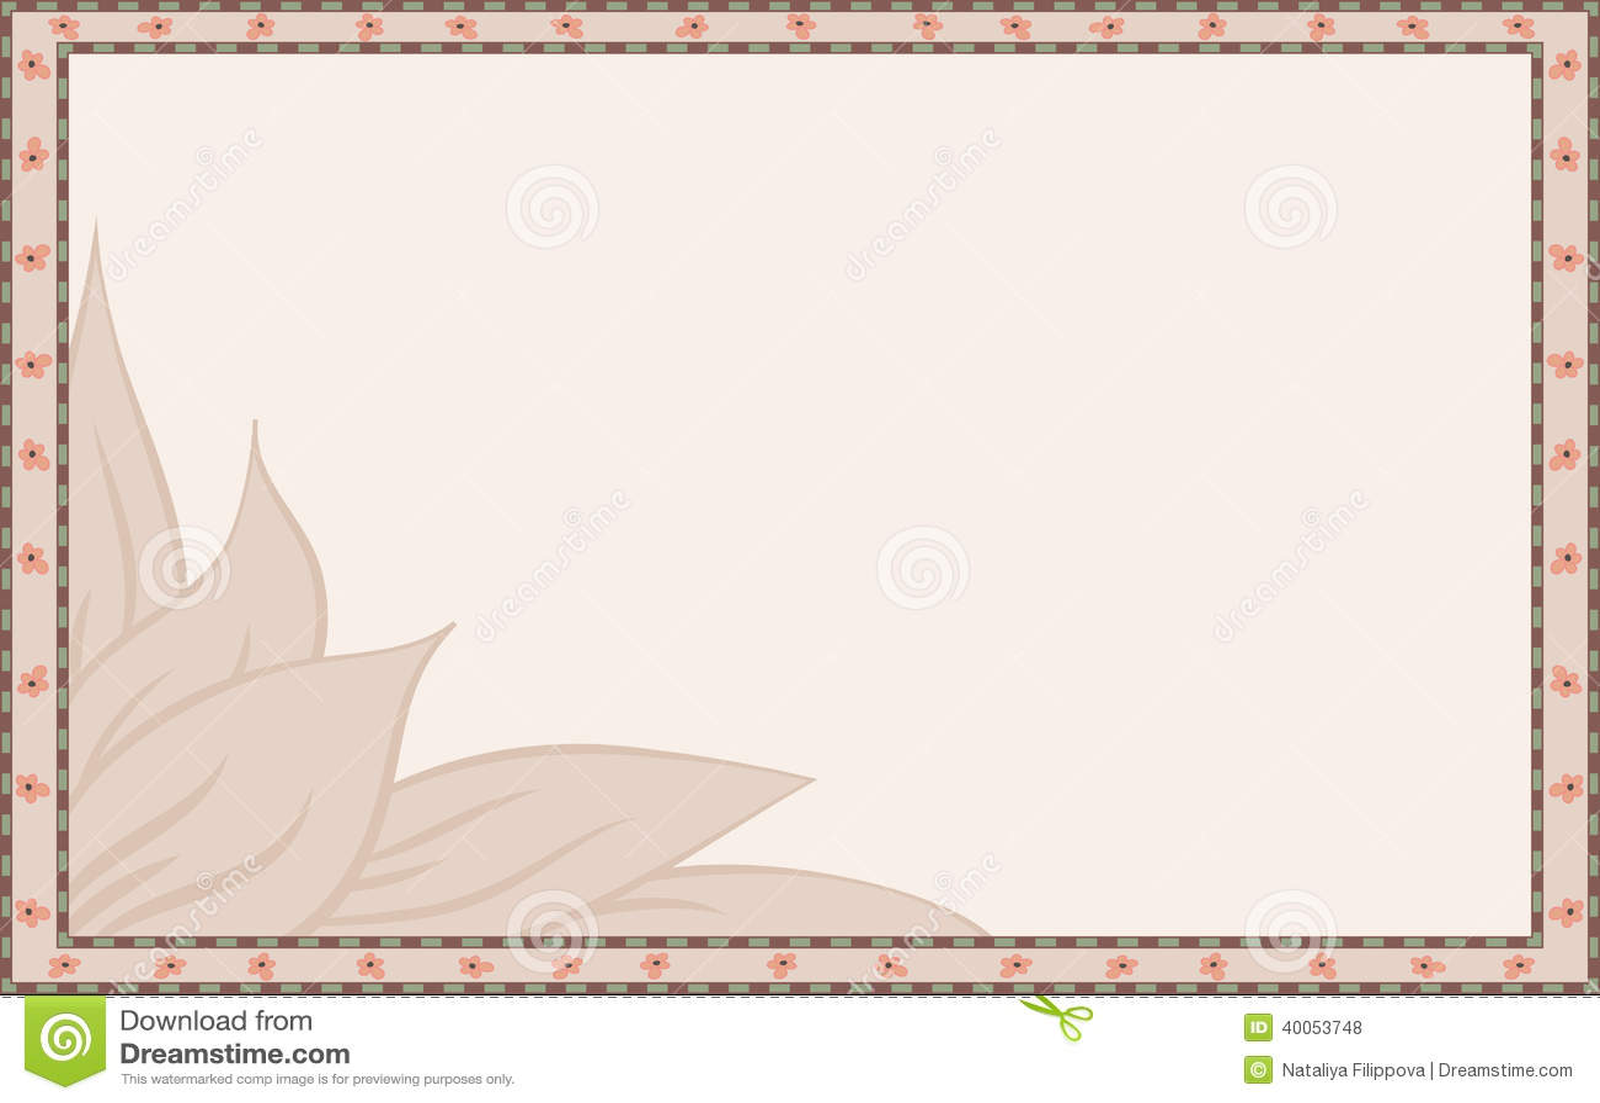 cadre simple illustration de vecteur image 40053748. Black Bedroom Furniture Sets. Home Design Ideas